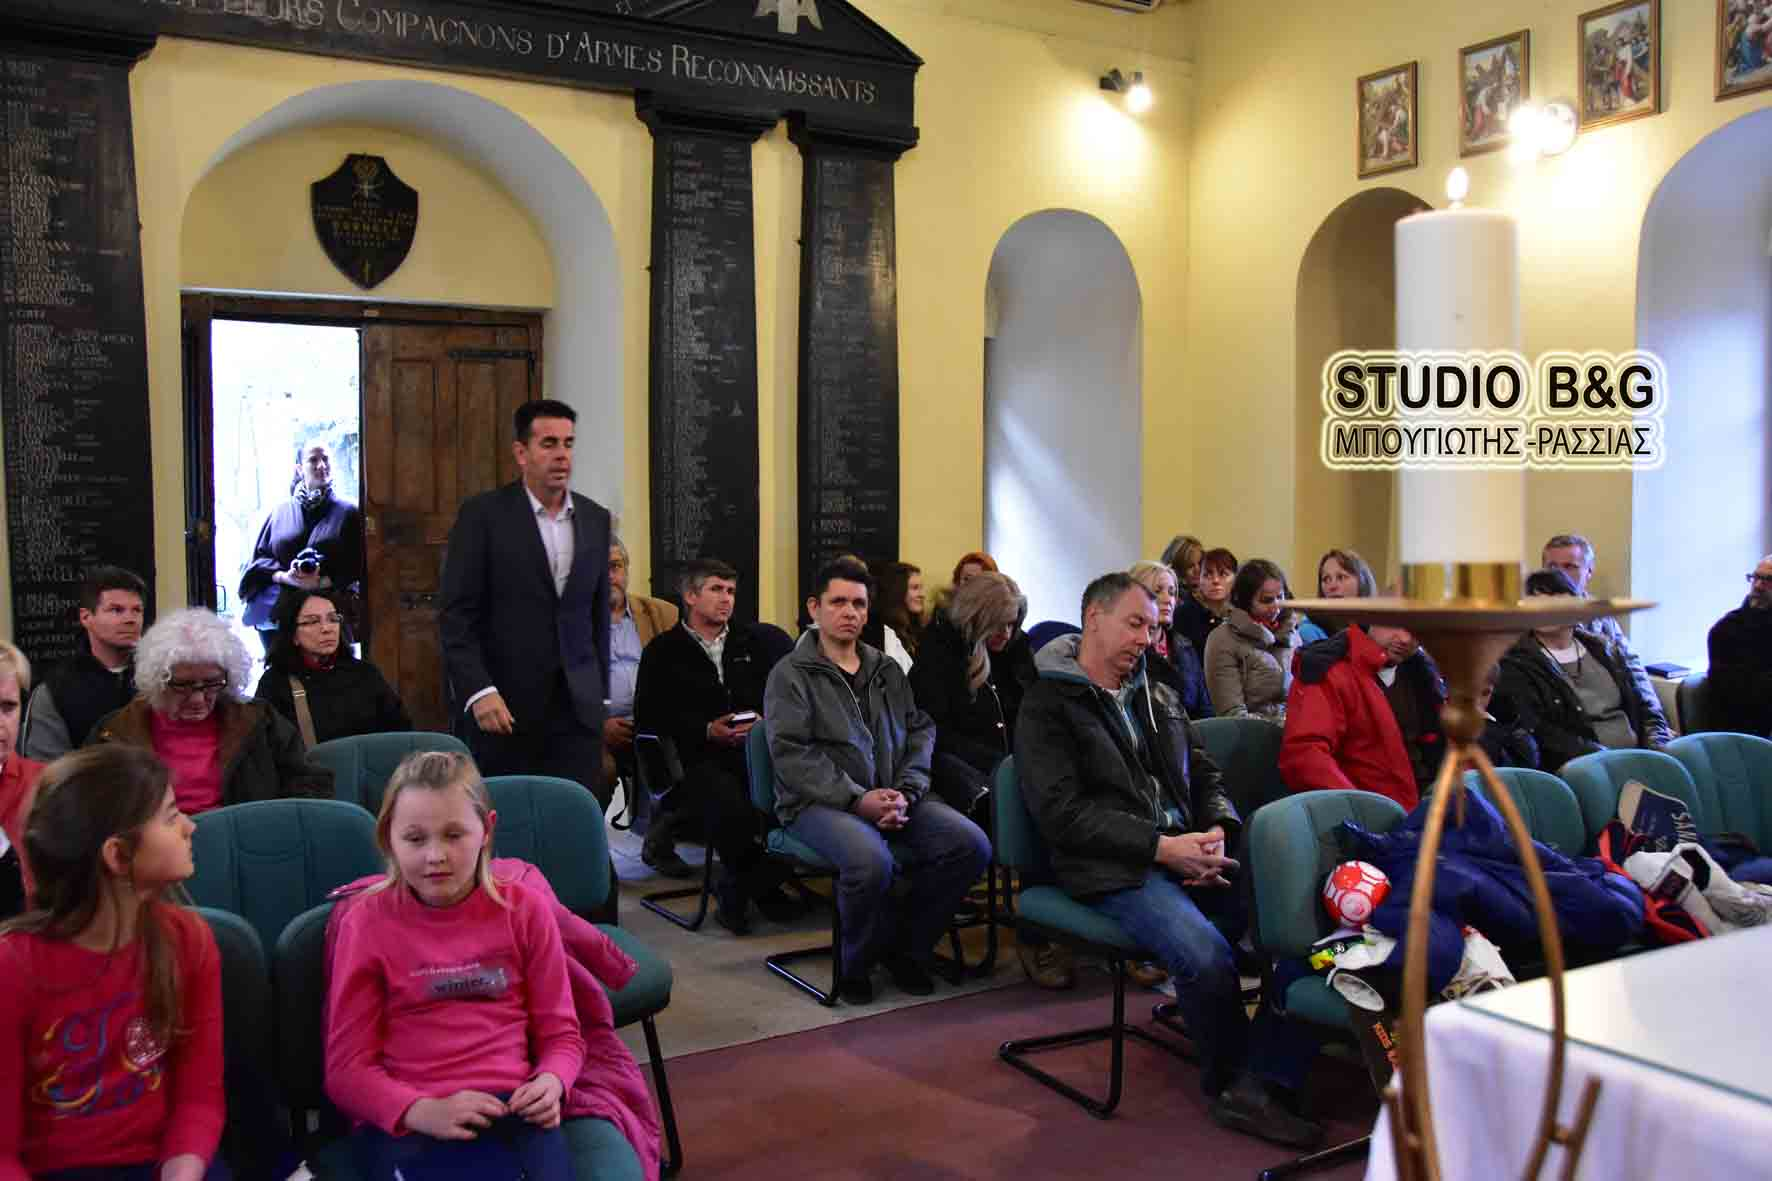 You are currently viewing Εκδήλωση  στην Καθολική Εκκλησία Ναυπλίου για τον εορτασμό της Ελληνικής Επανάστασης και του φιλελληνικού κινήματος